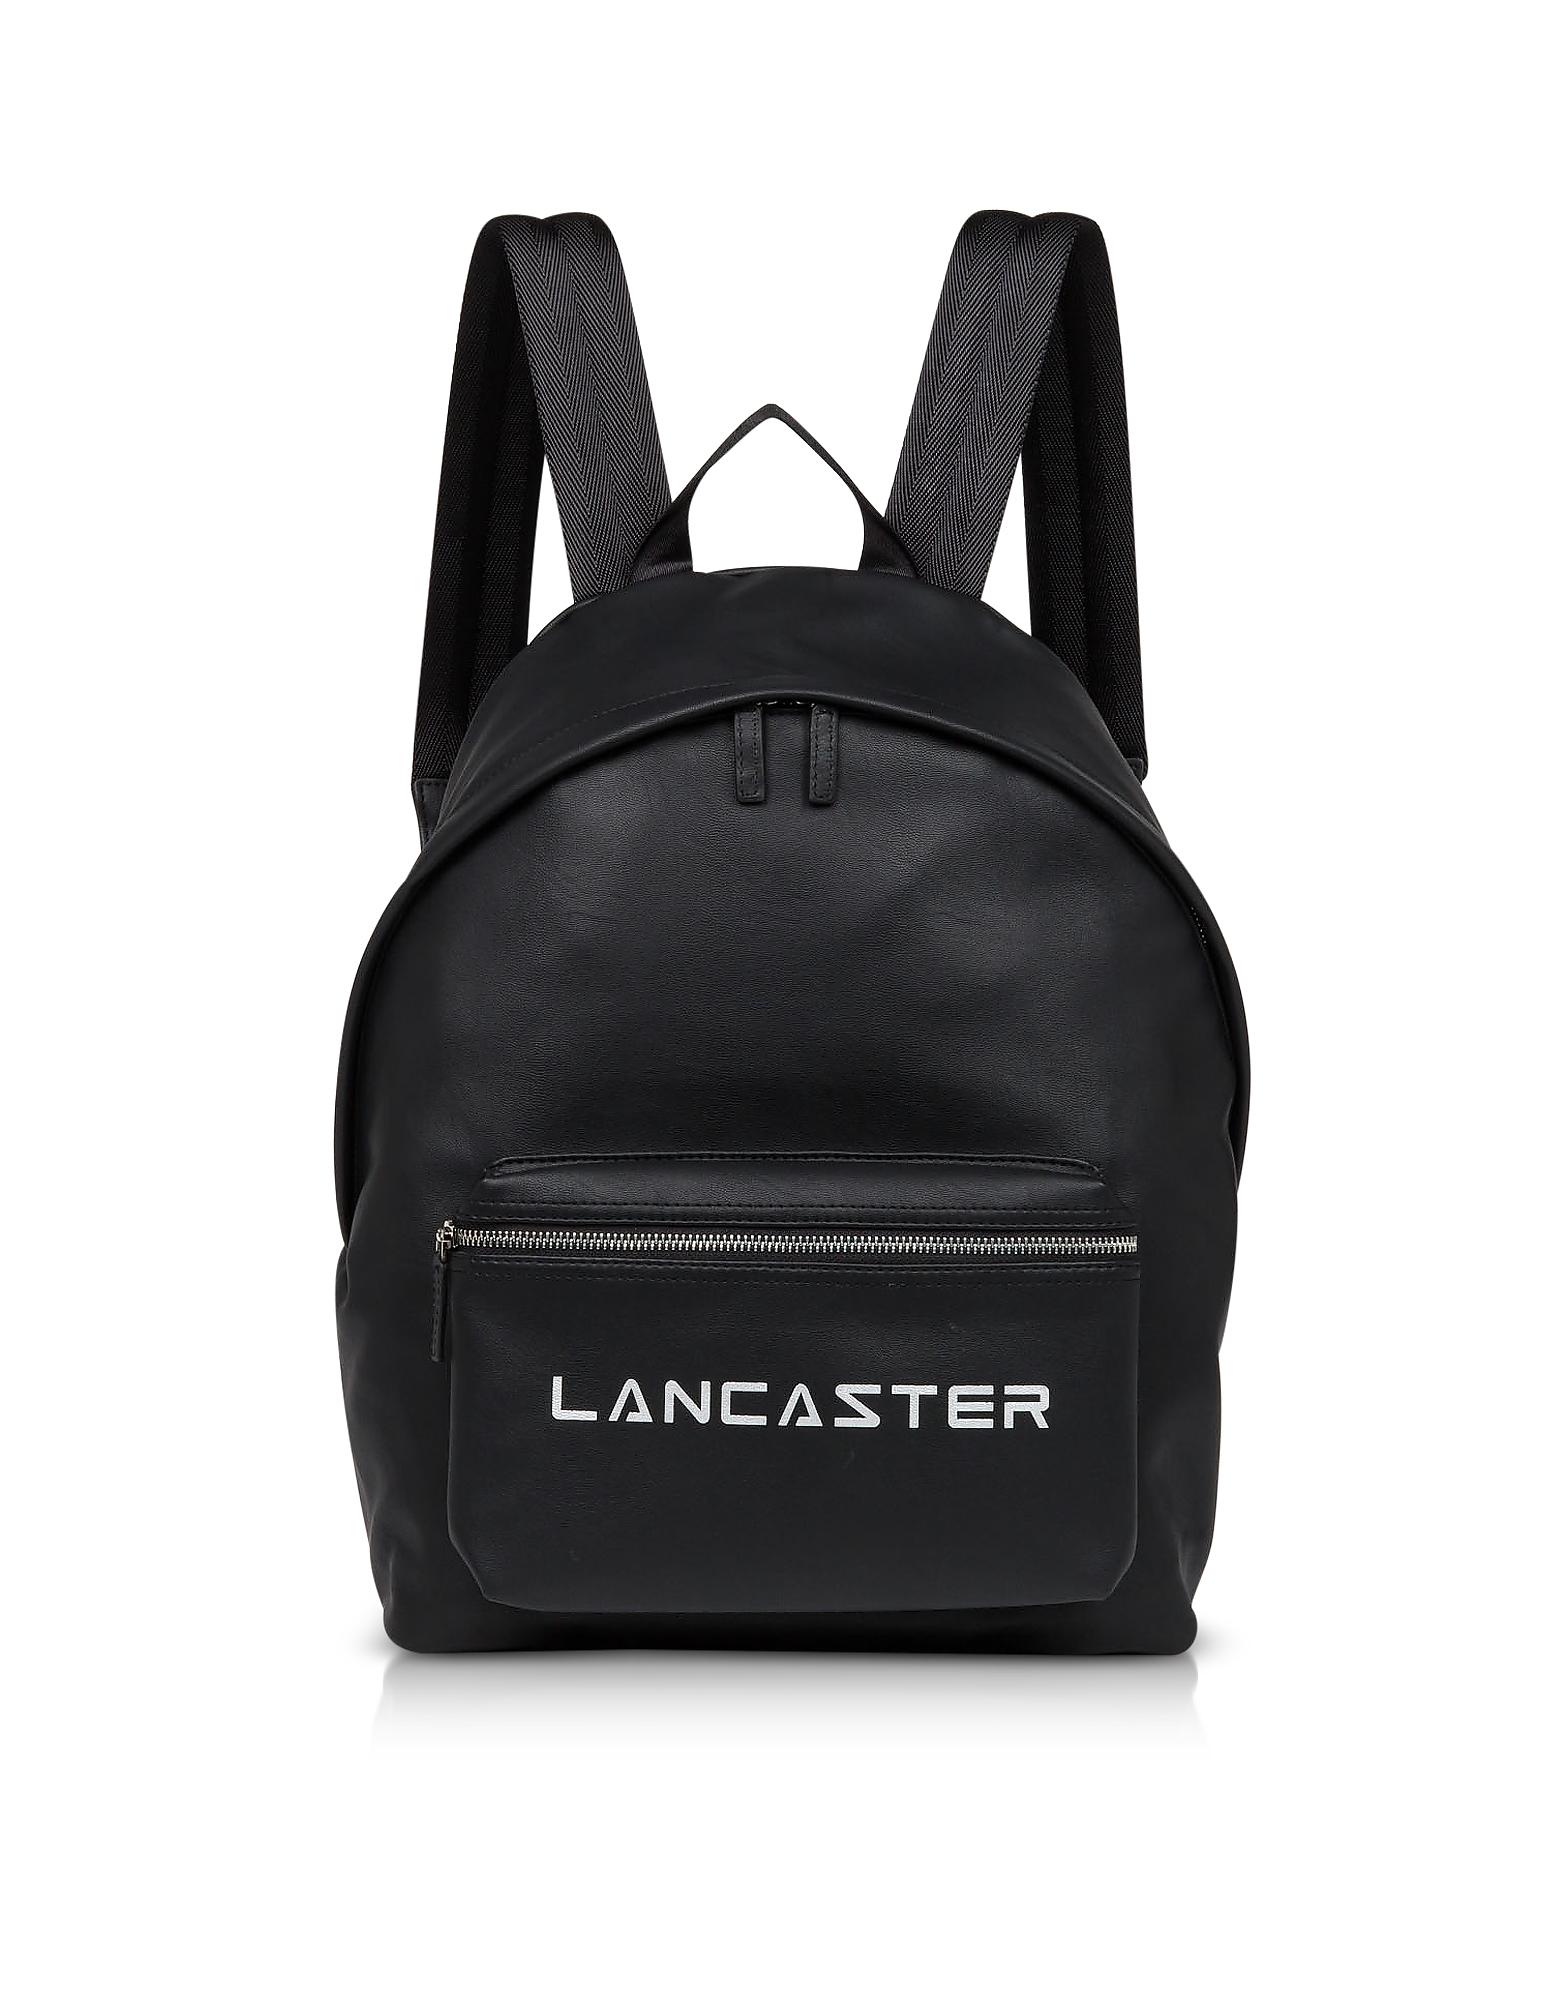 Lancaster Paris Designer Handbags, Street Black Backpack